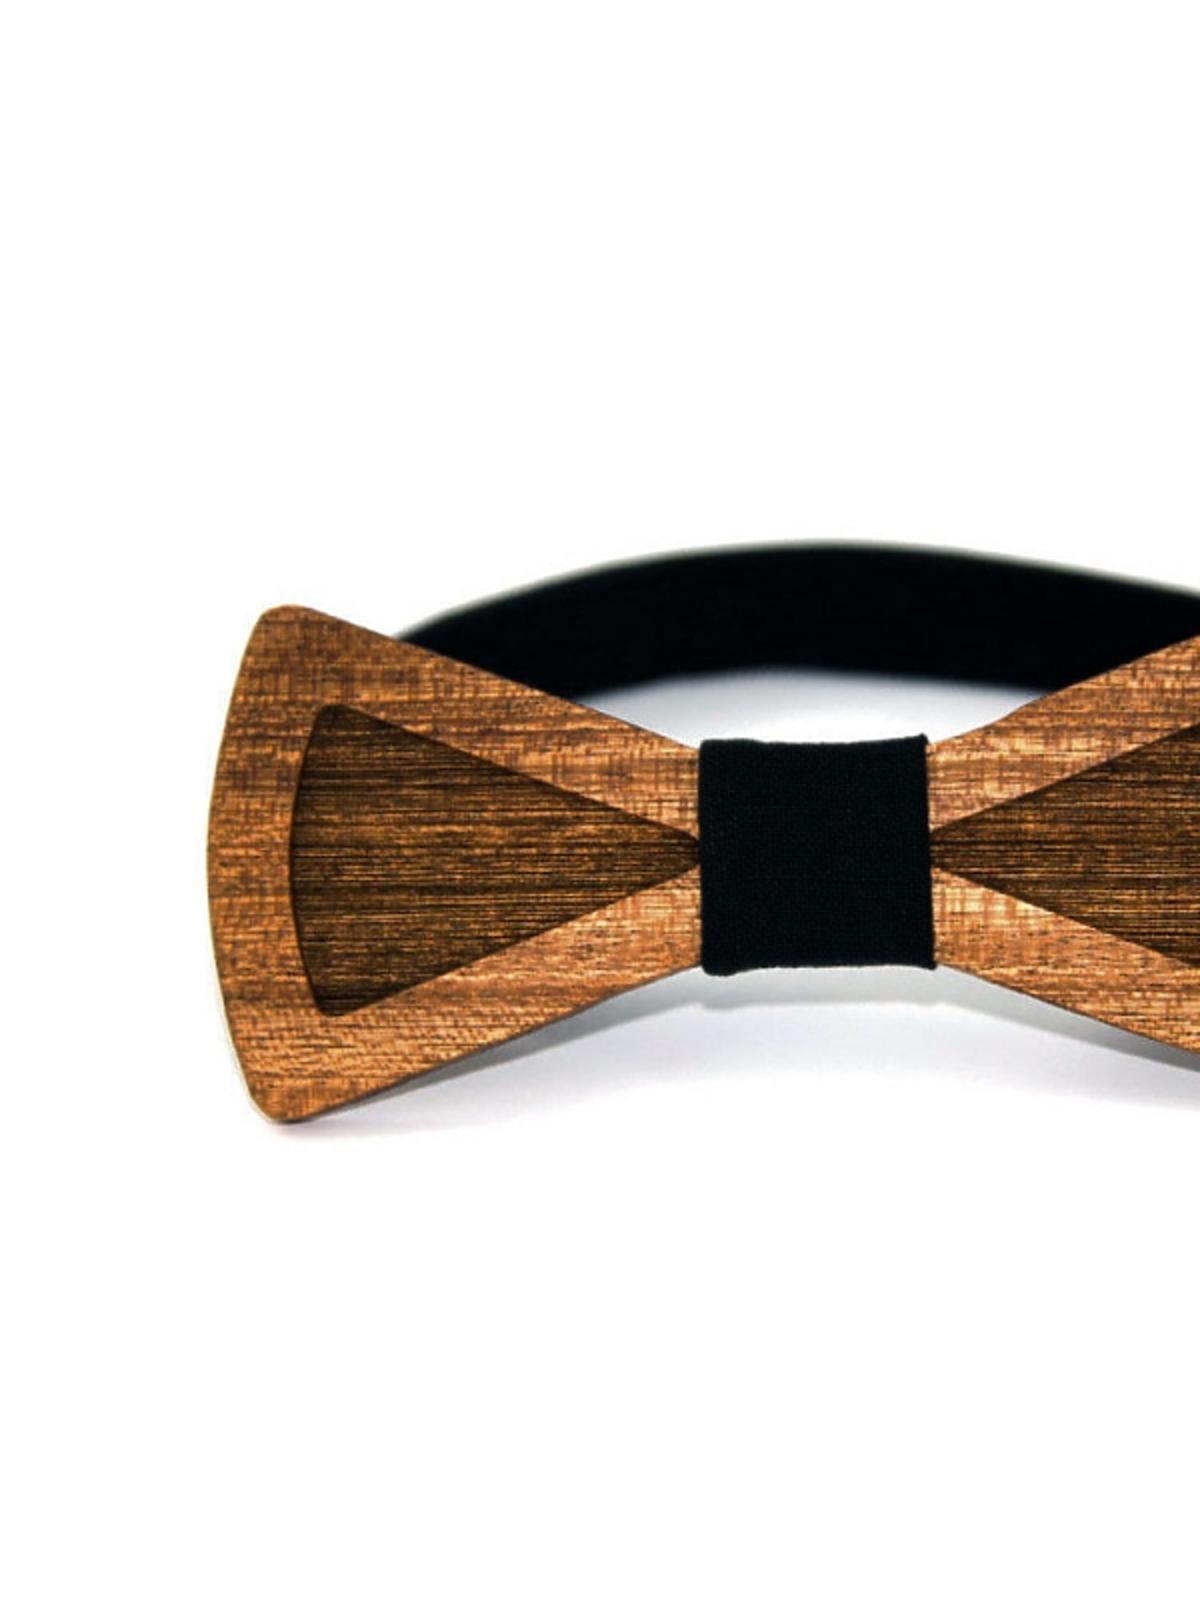 Drewniana mucha The Bow Bow Ties/Pakamera.pl, 99 zł